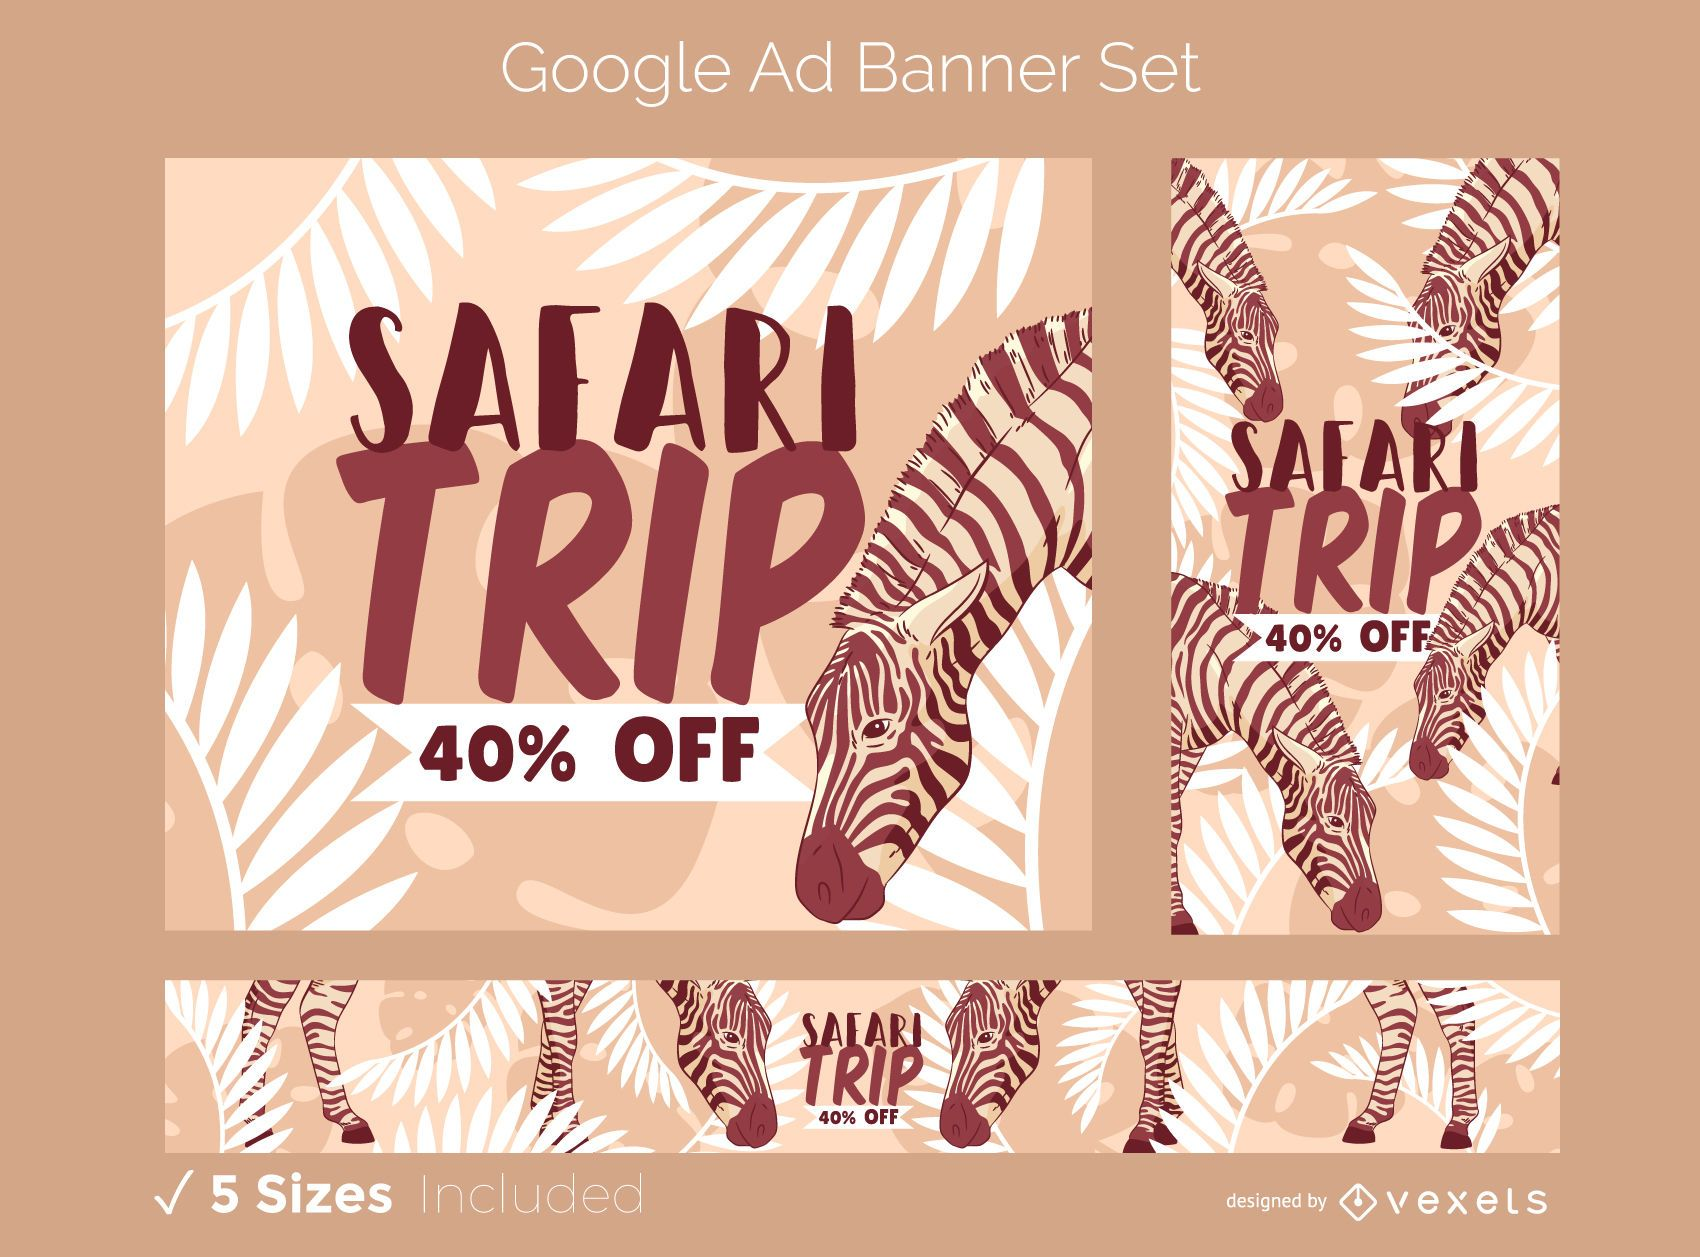 Safari Trip Google Ad Design Set